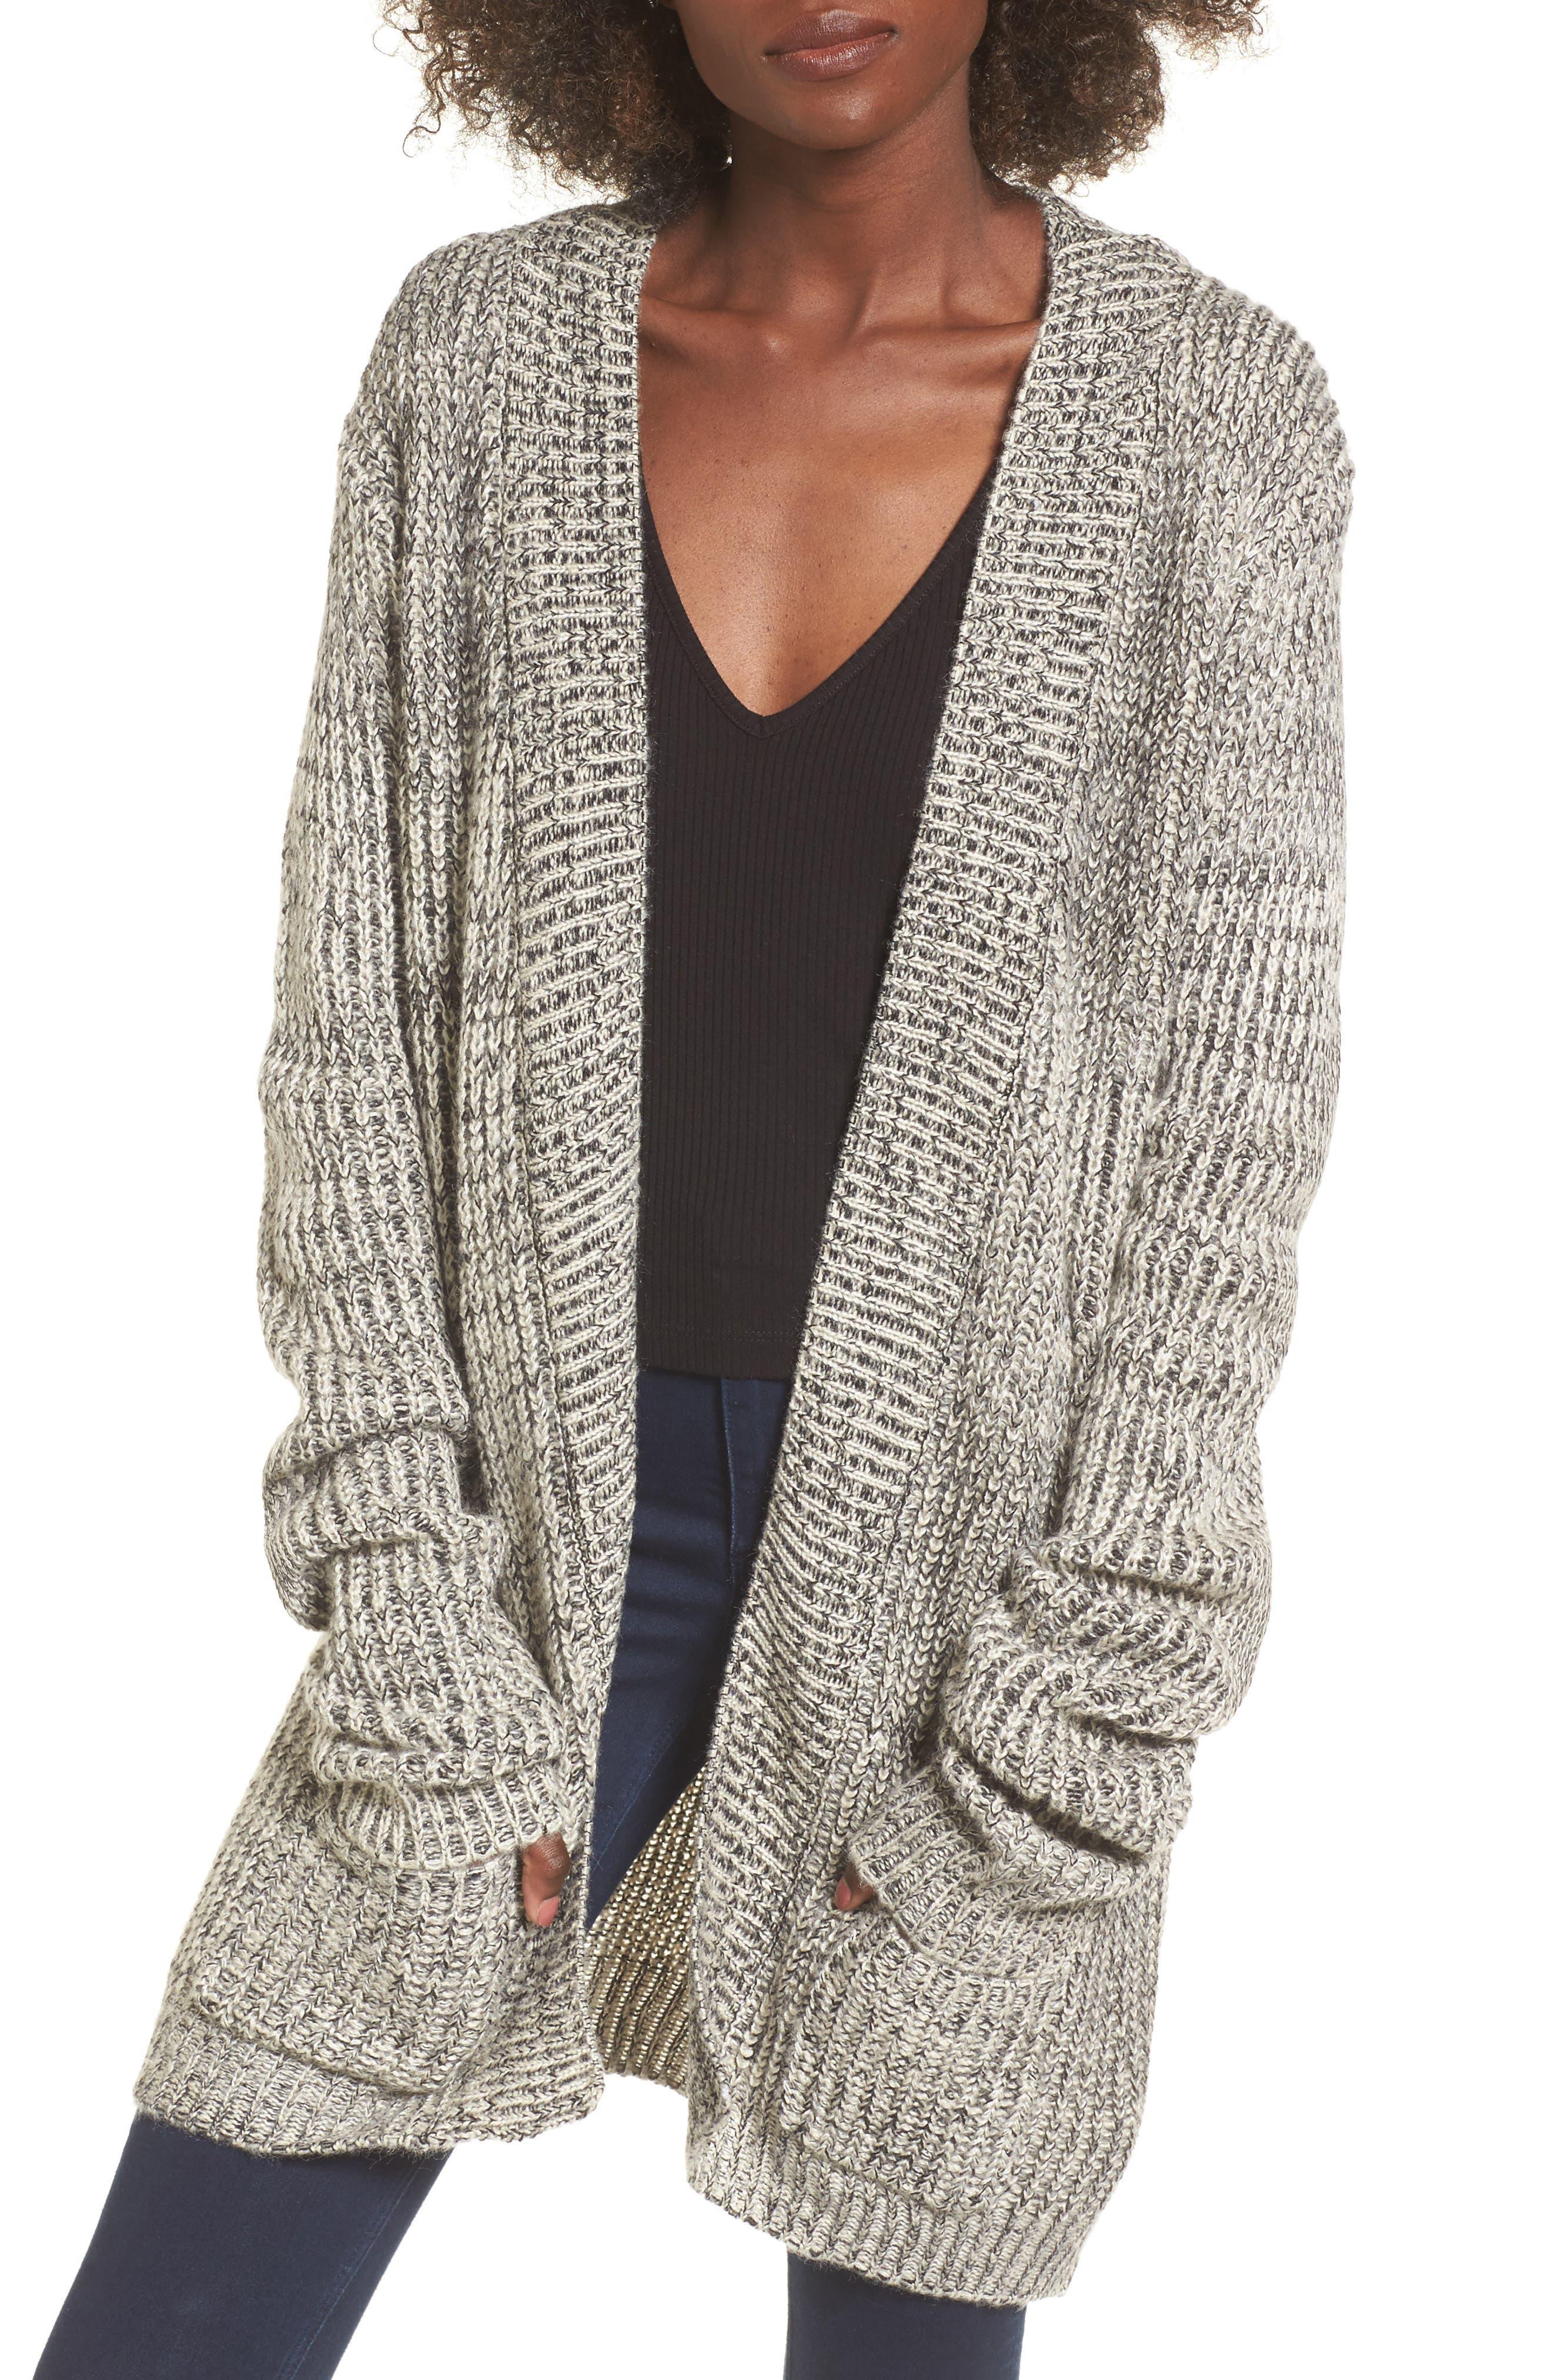 Cotton Emporium Cable Knit Cardigan